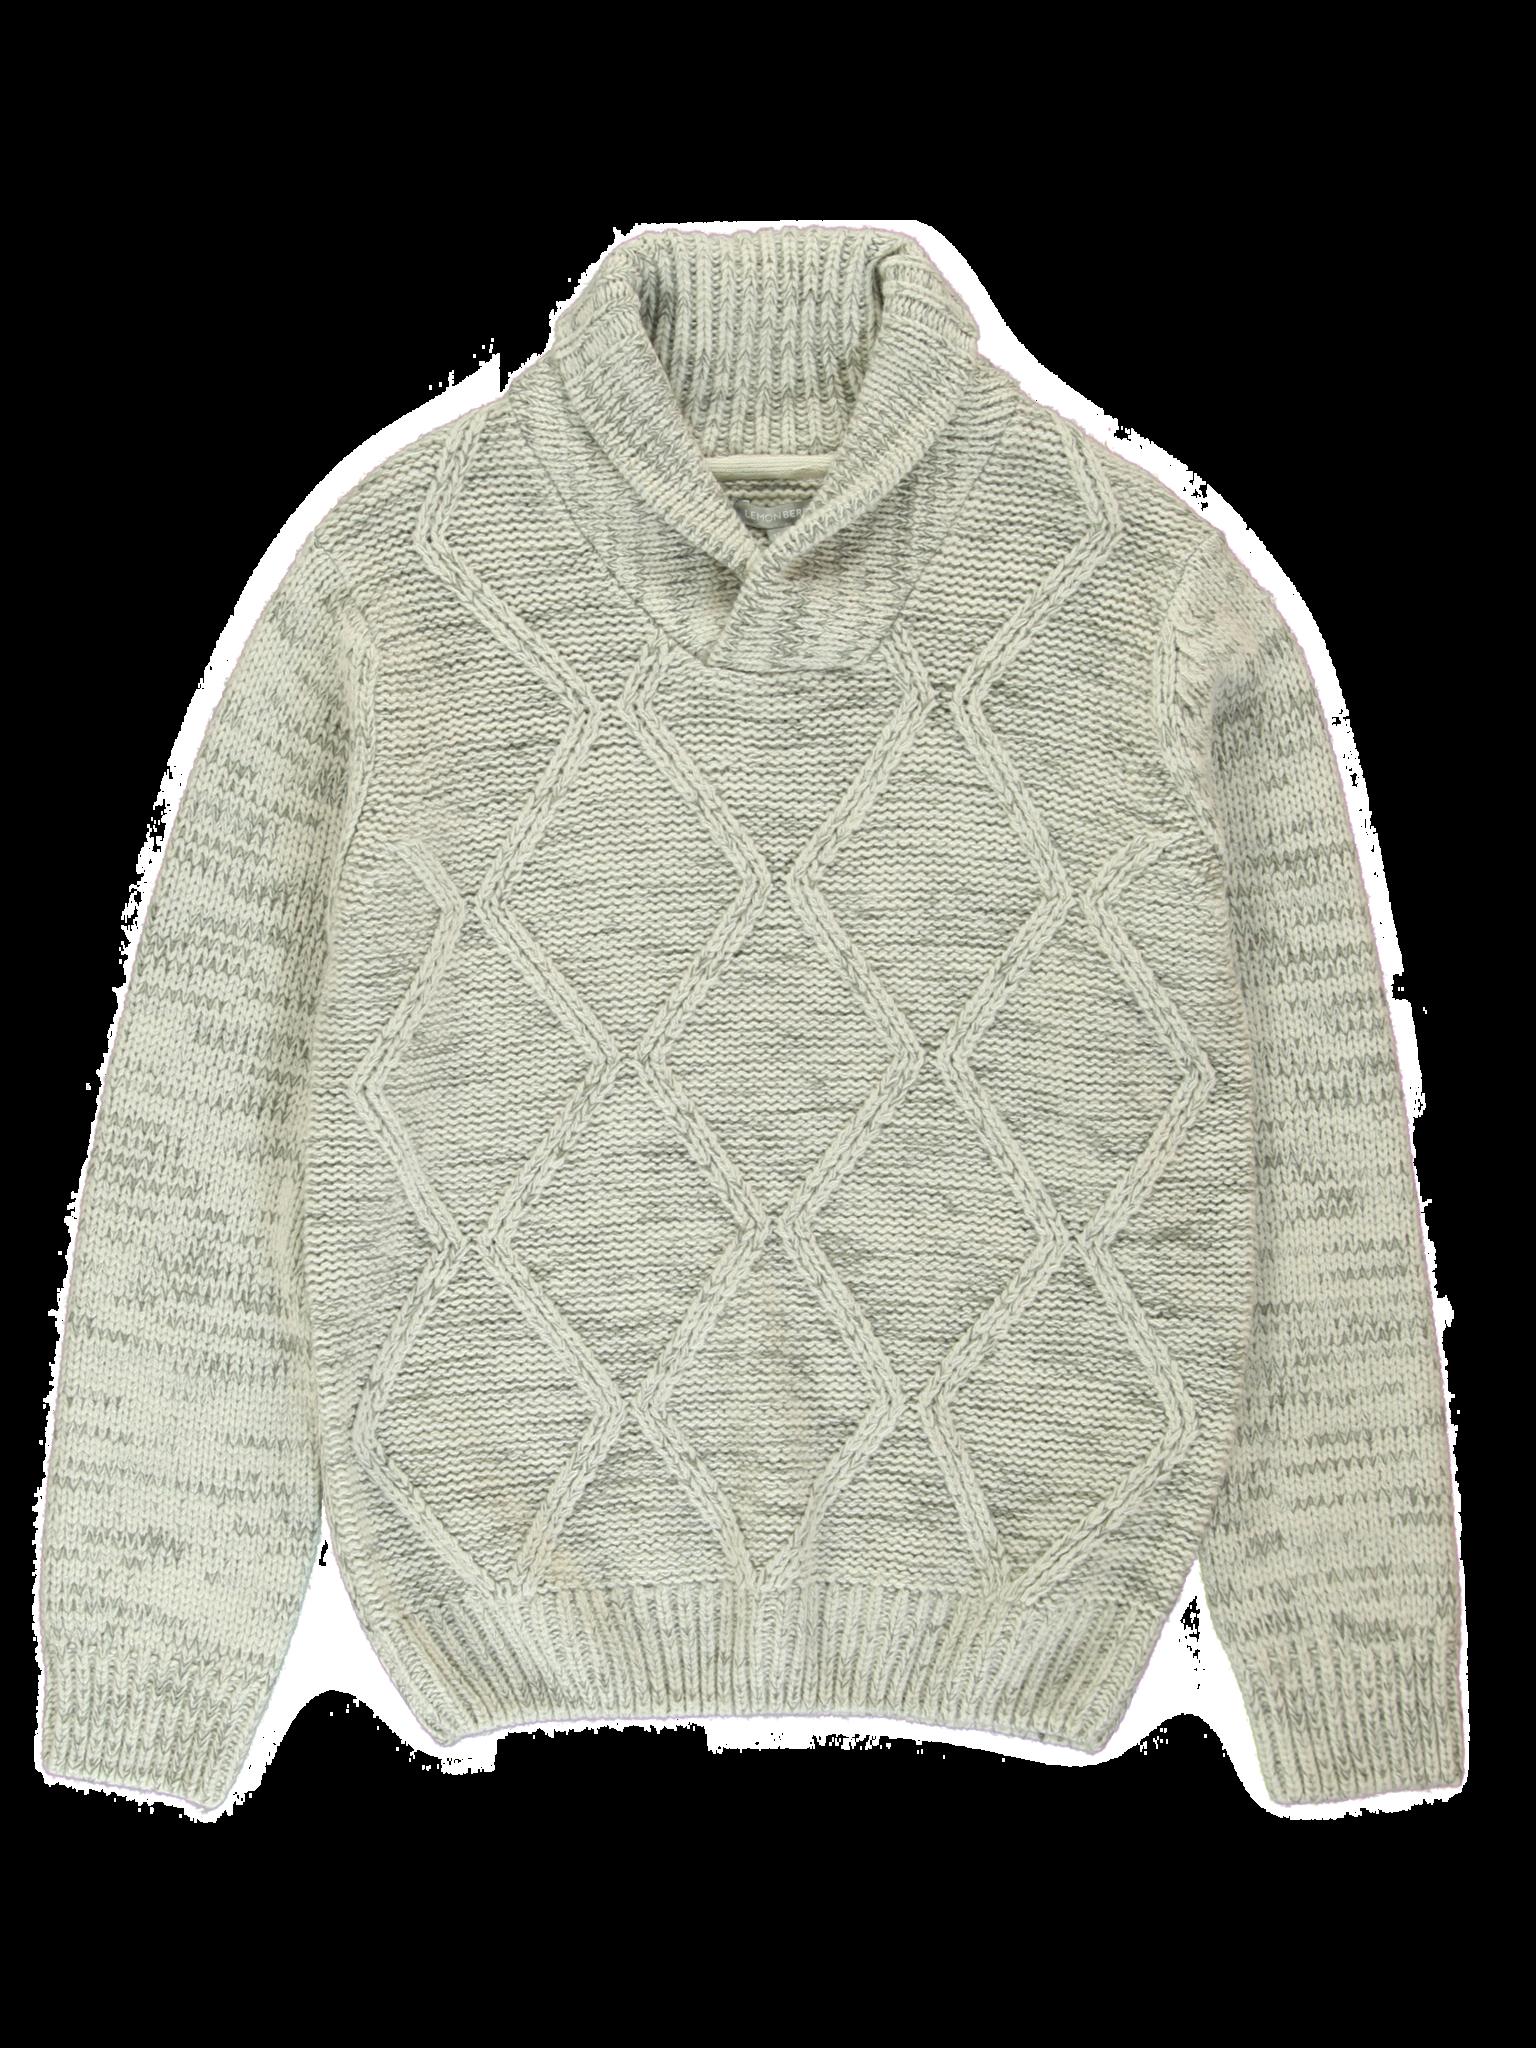 All Brands | Winterproducts Teen Boys | Pull | 12 pcs/box